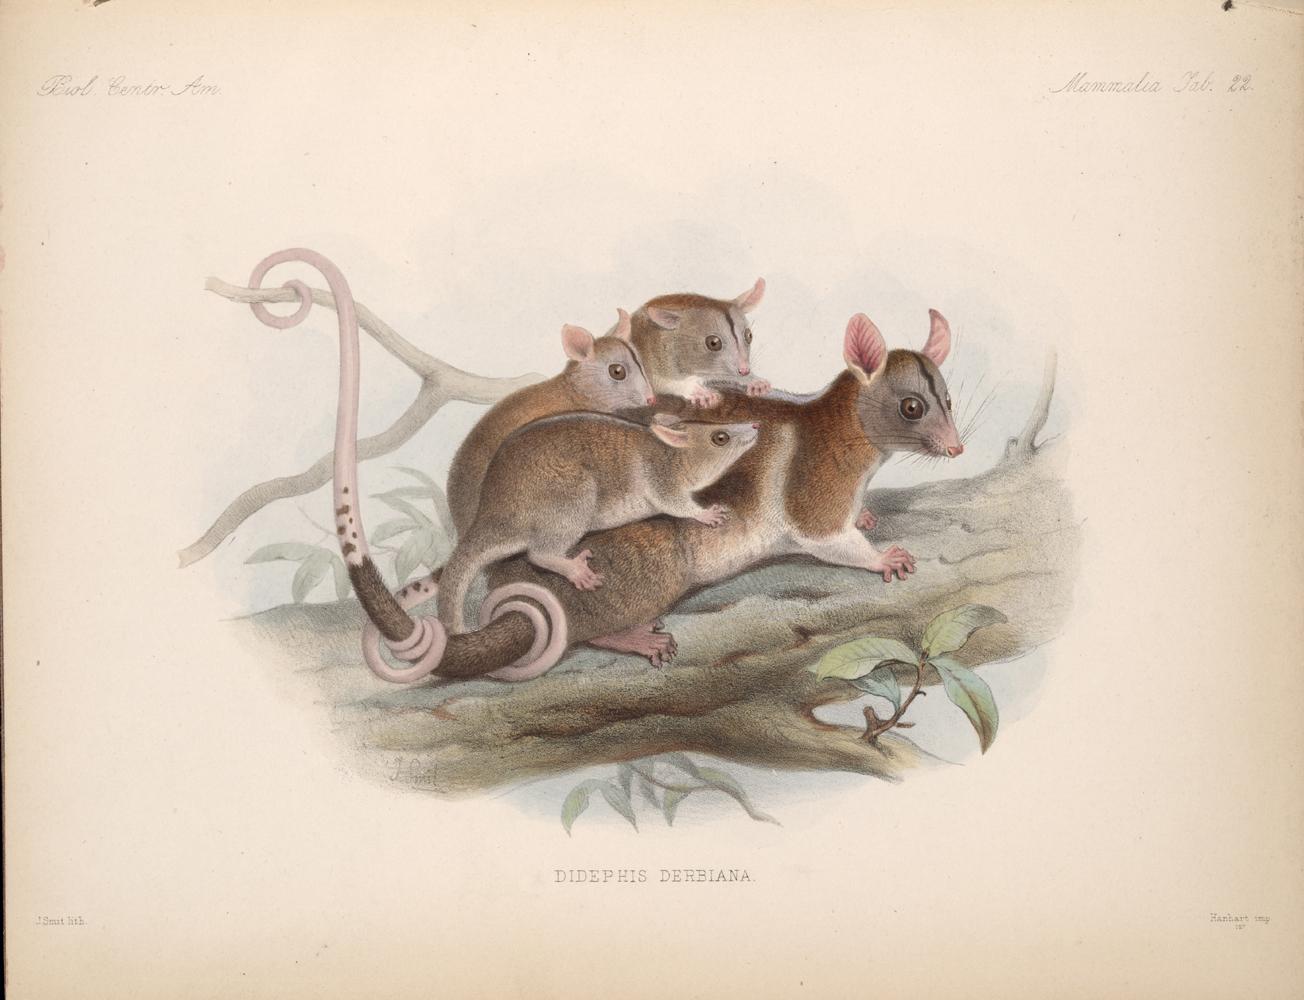 Mammals,  Image number:bca_02_00_00_291